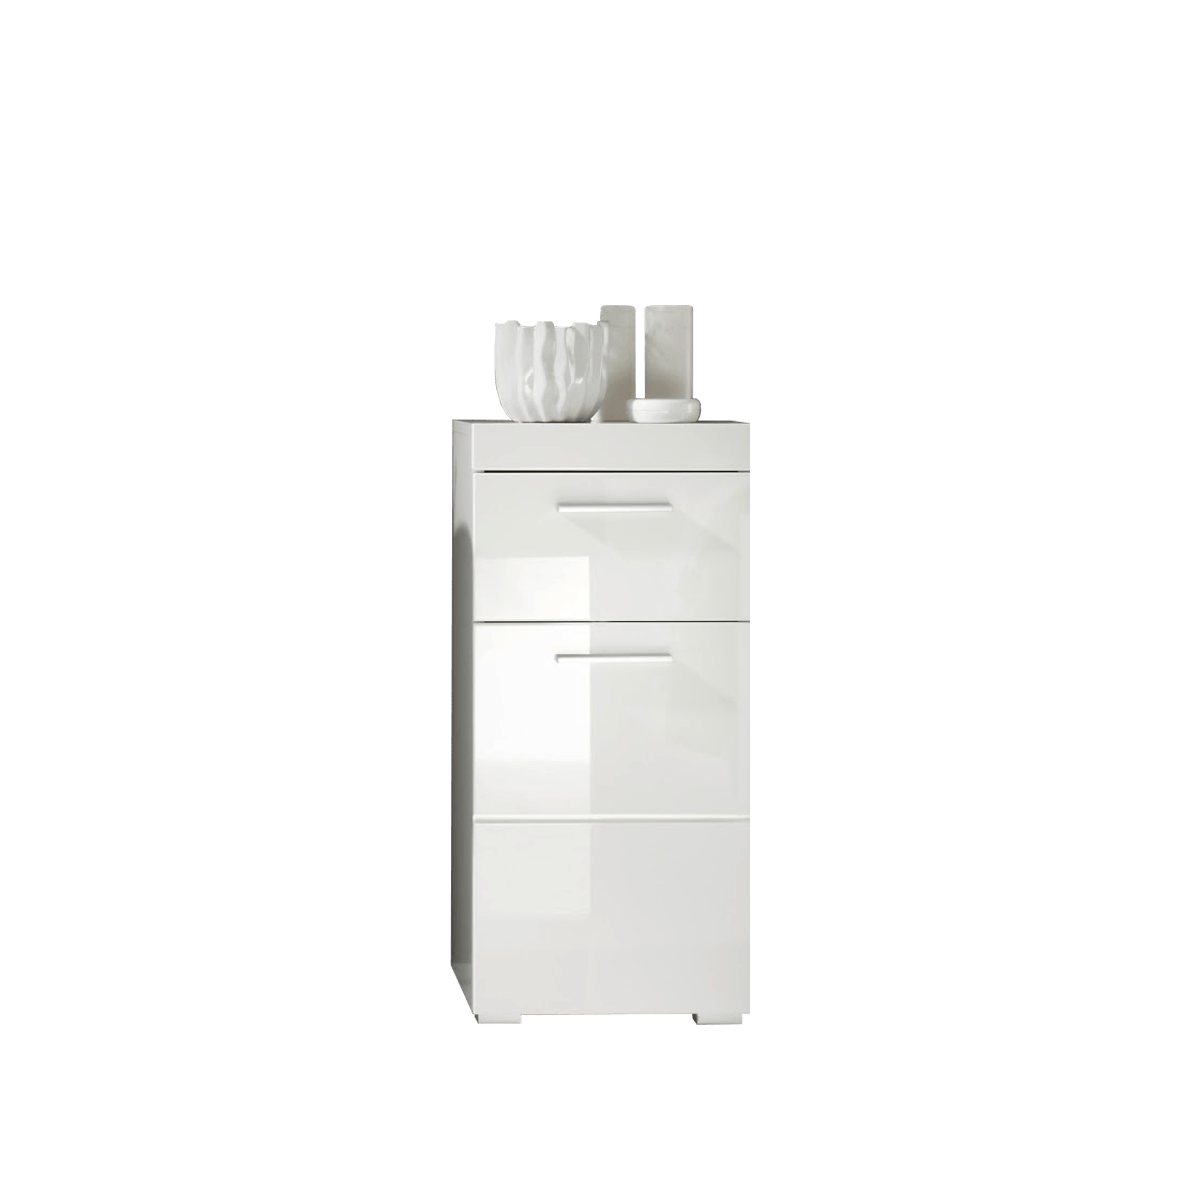 Badezimmerschrank Weiss Glänzend